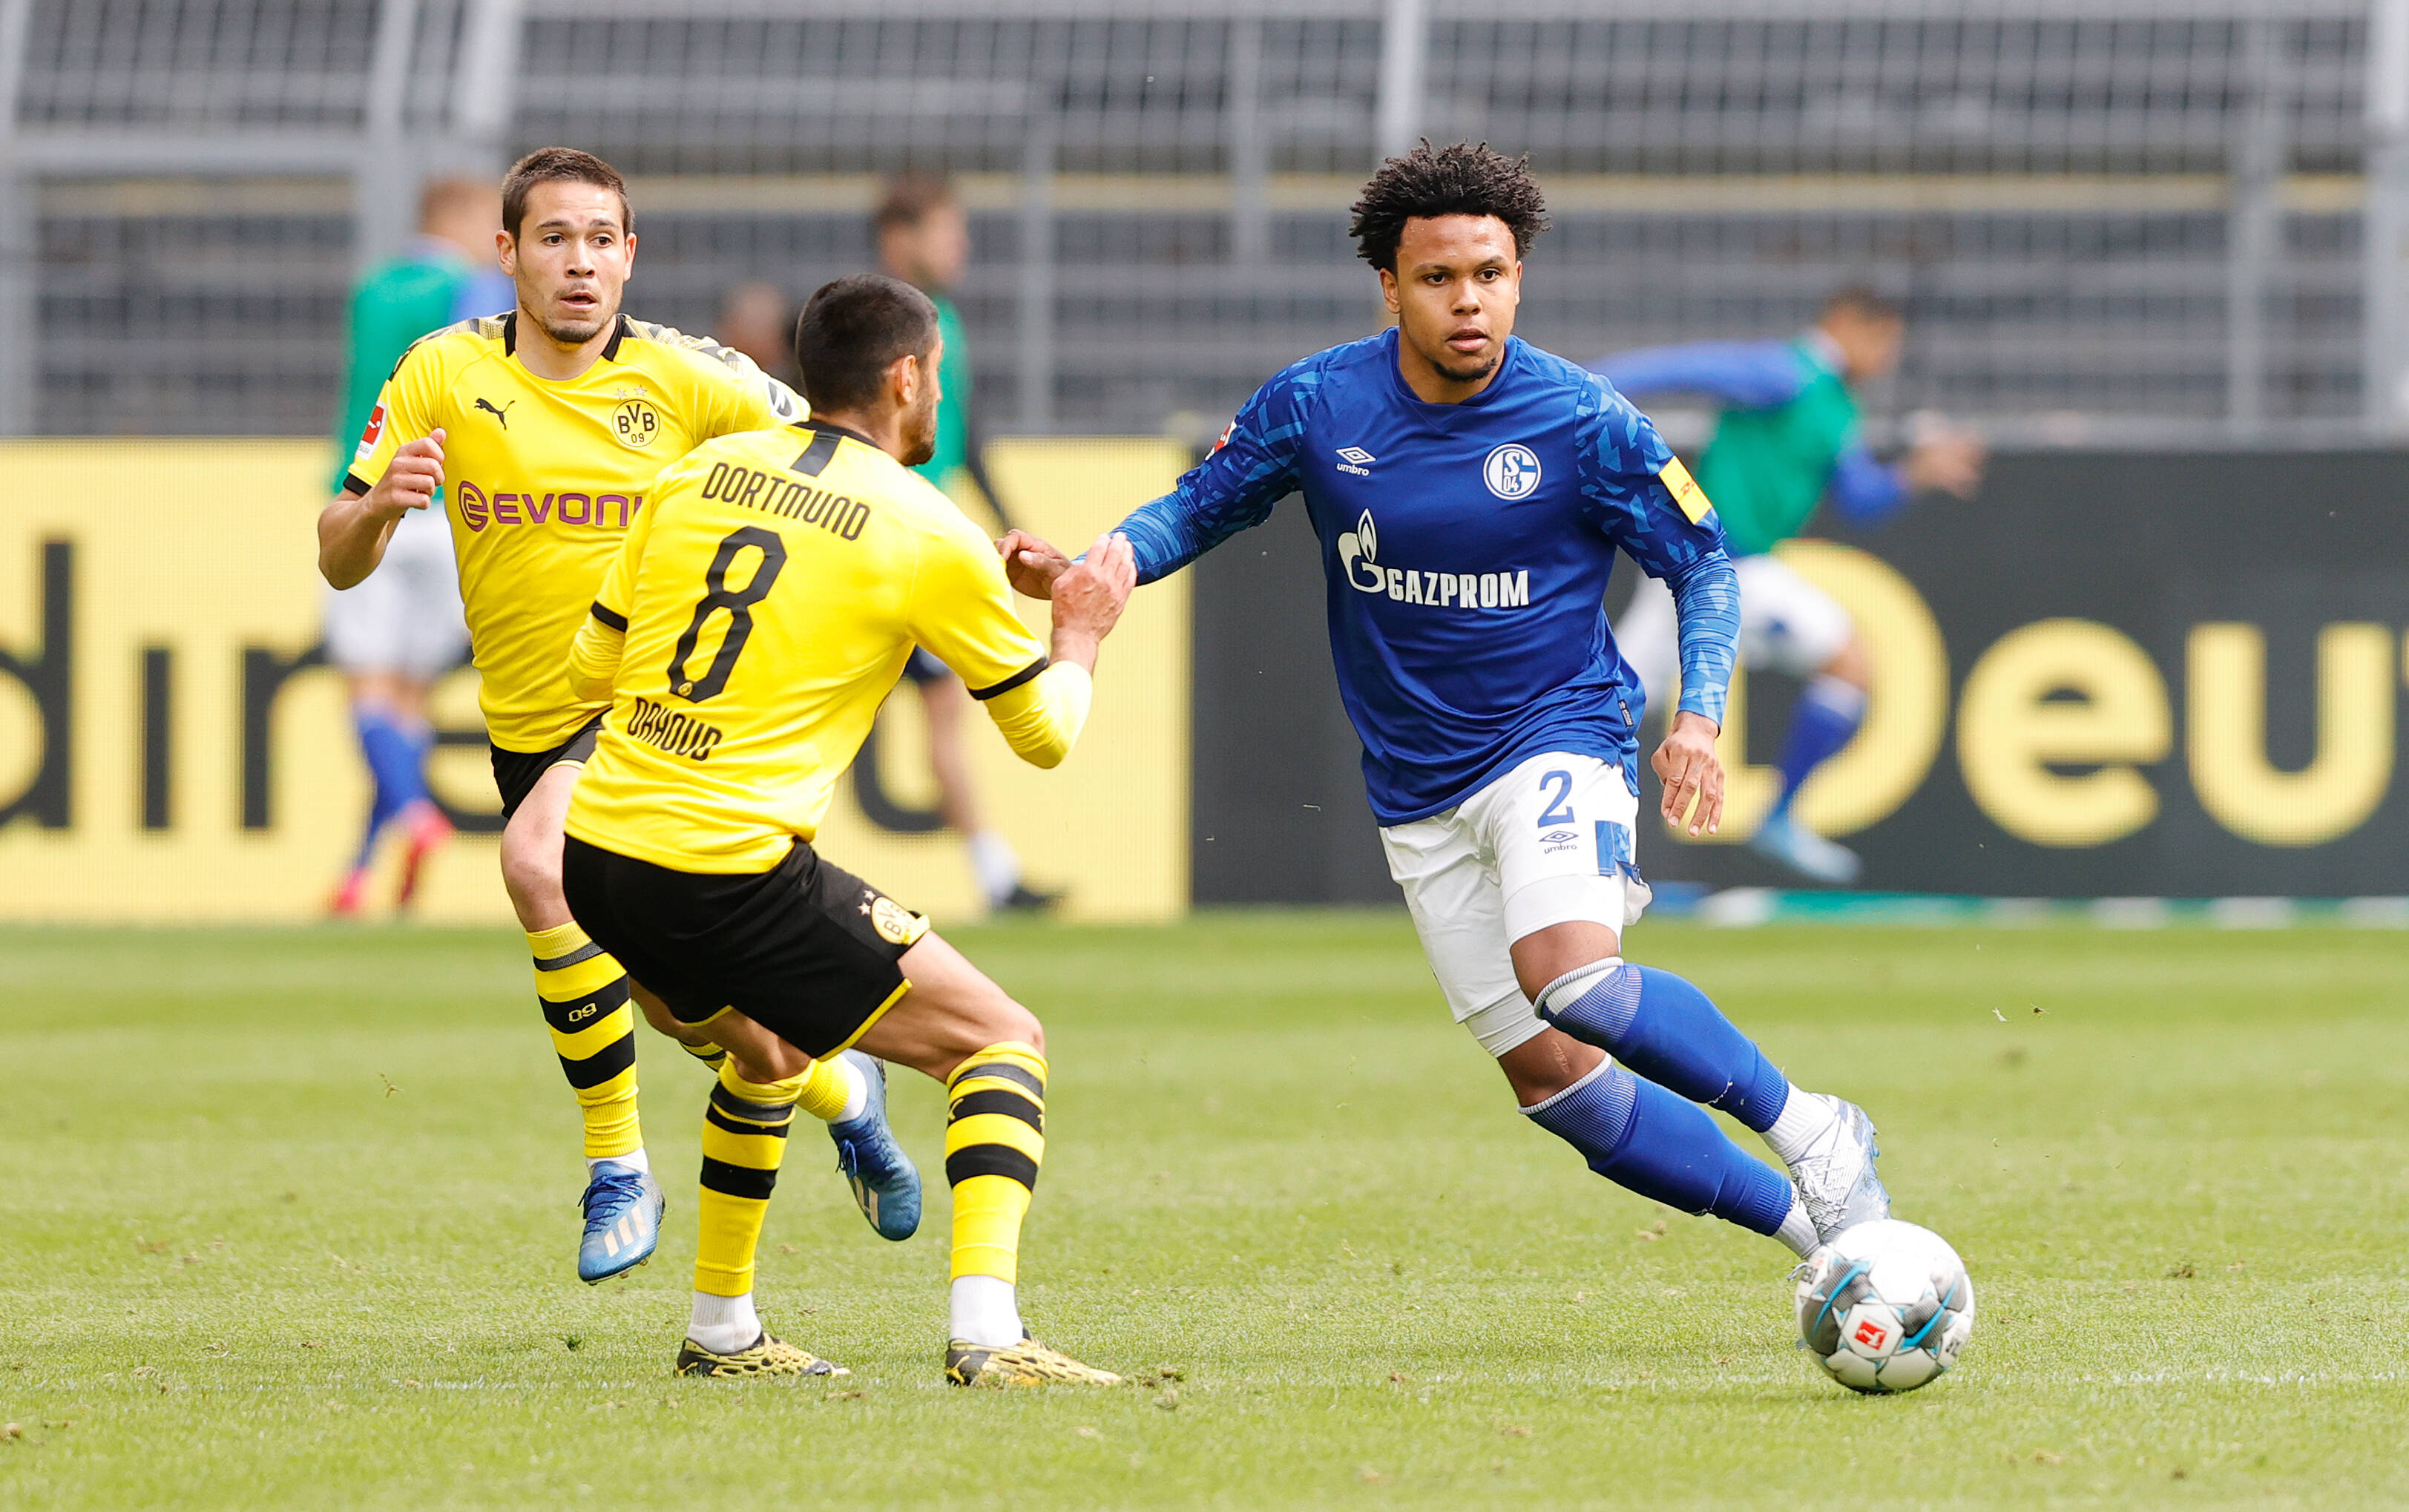 Football - Etranger - Bundesliga : la 27e journée en direct